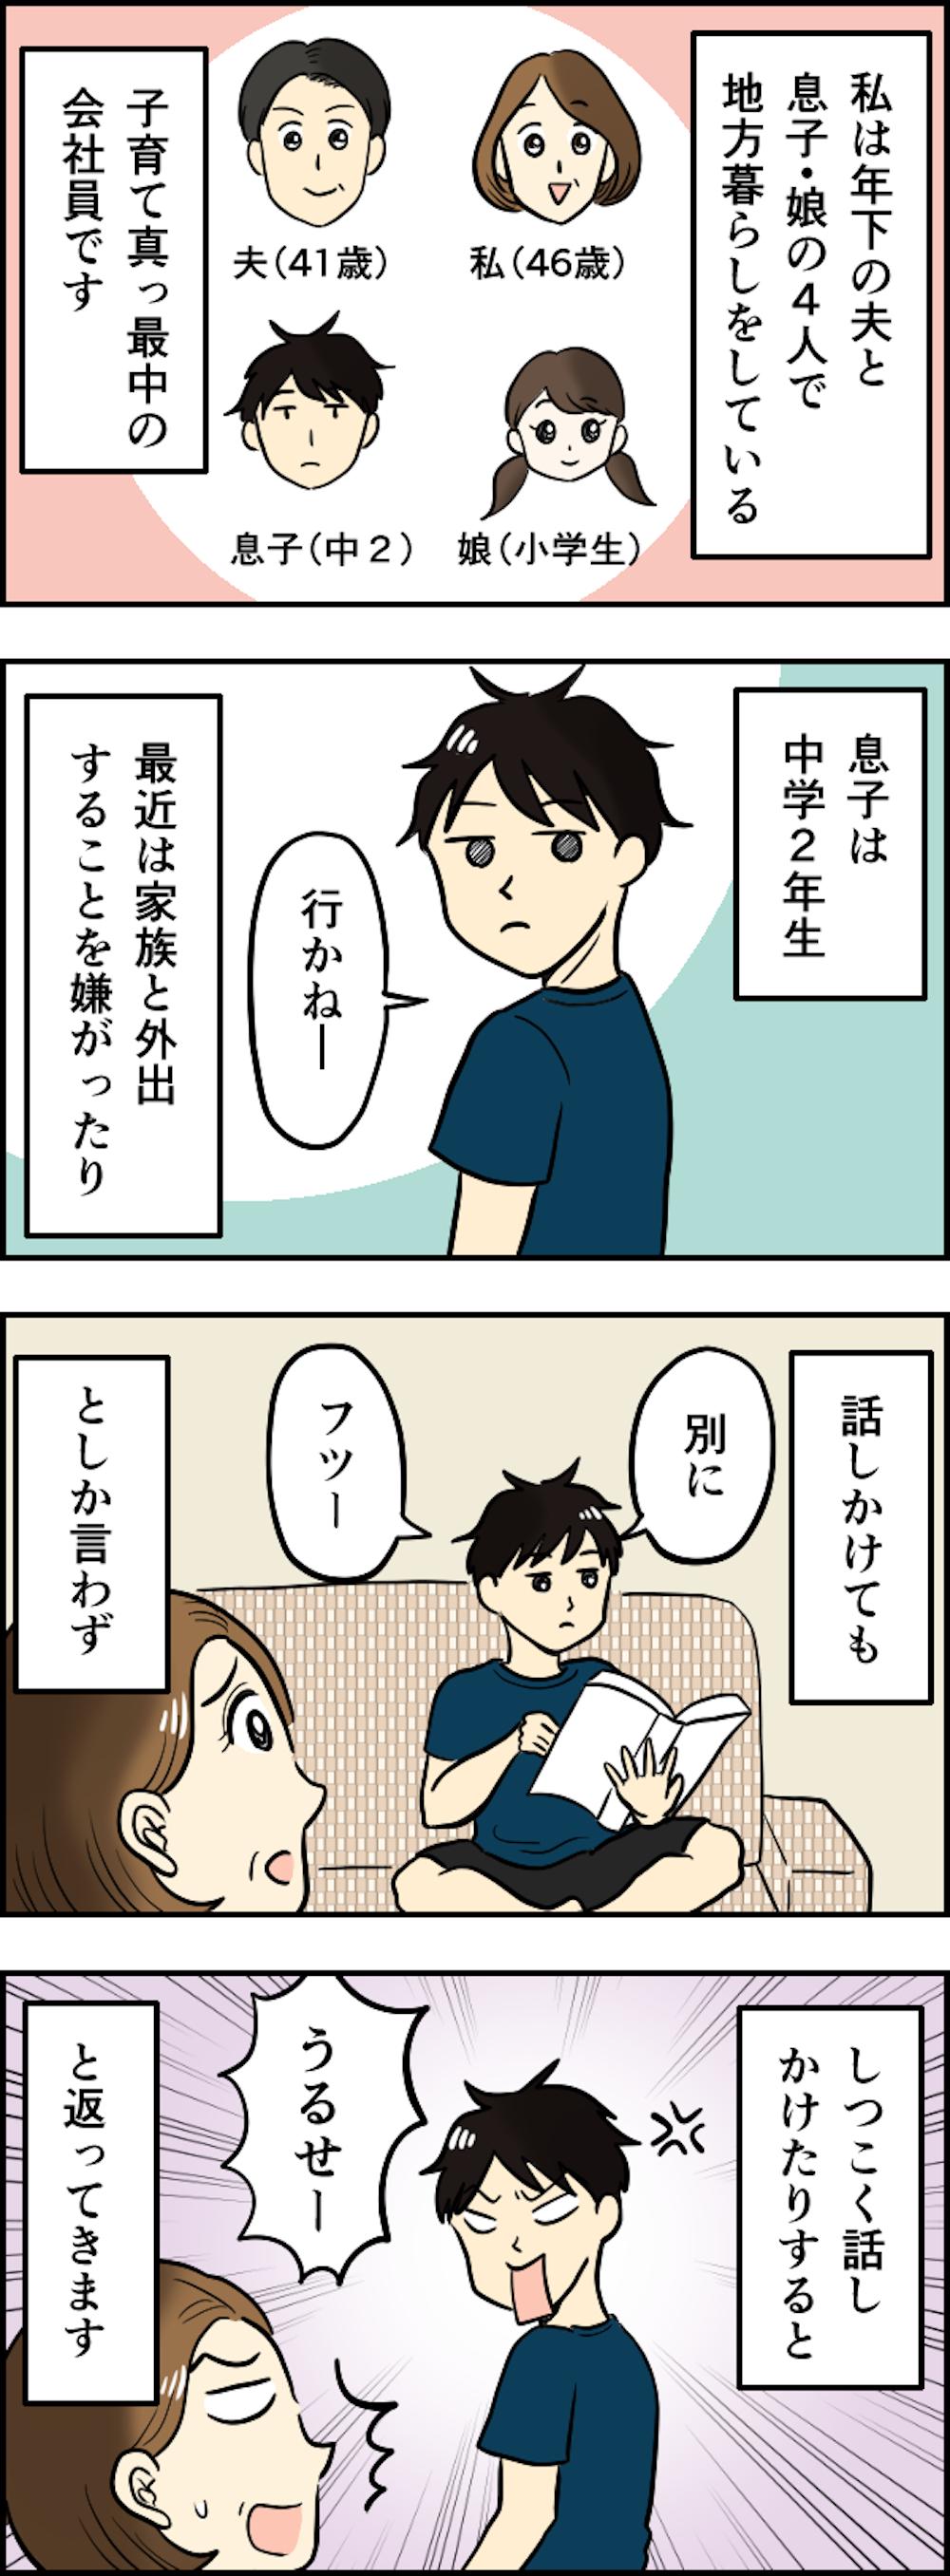 31kansei_01.png